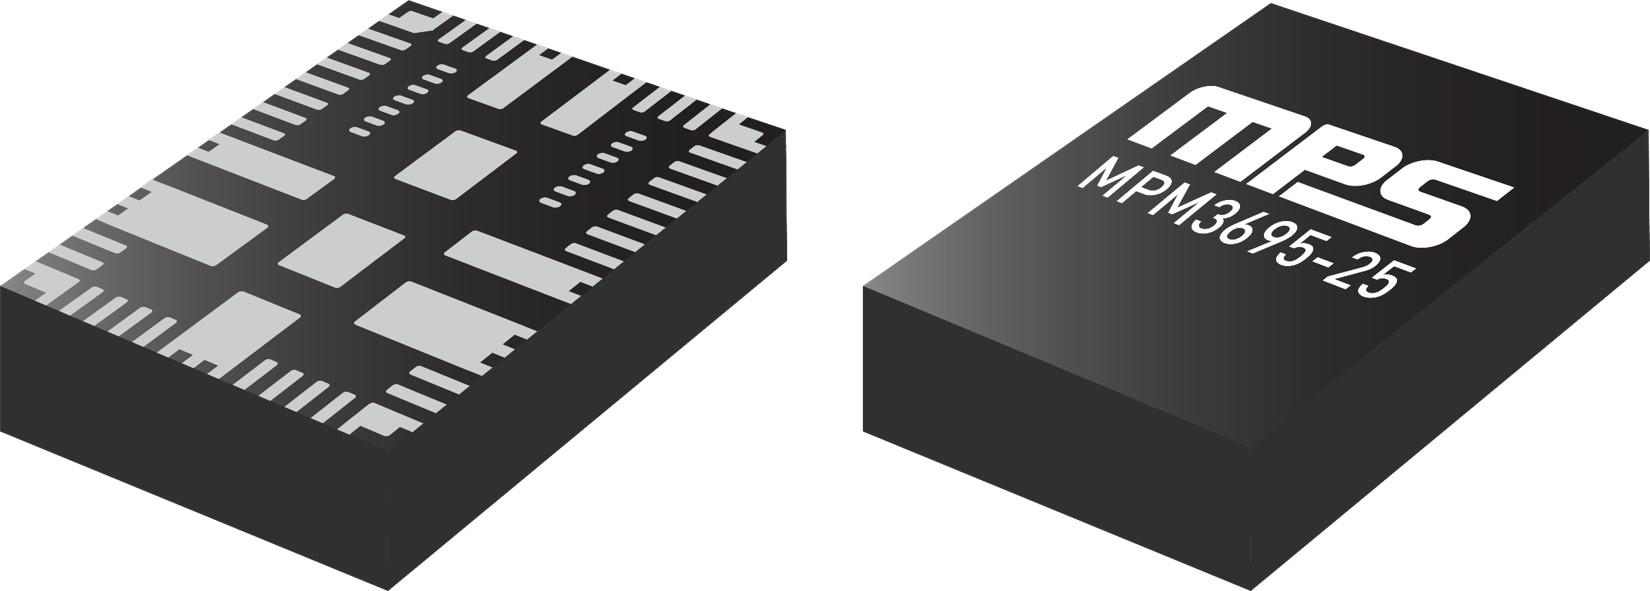 Figure 1: MPM3695-25, 25A Power Module